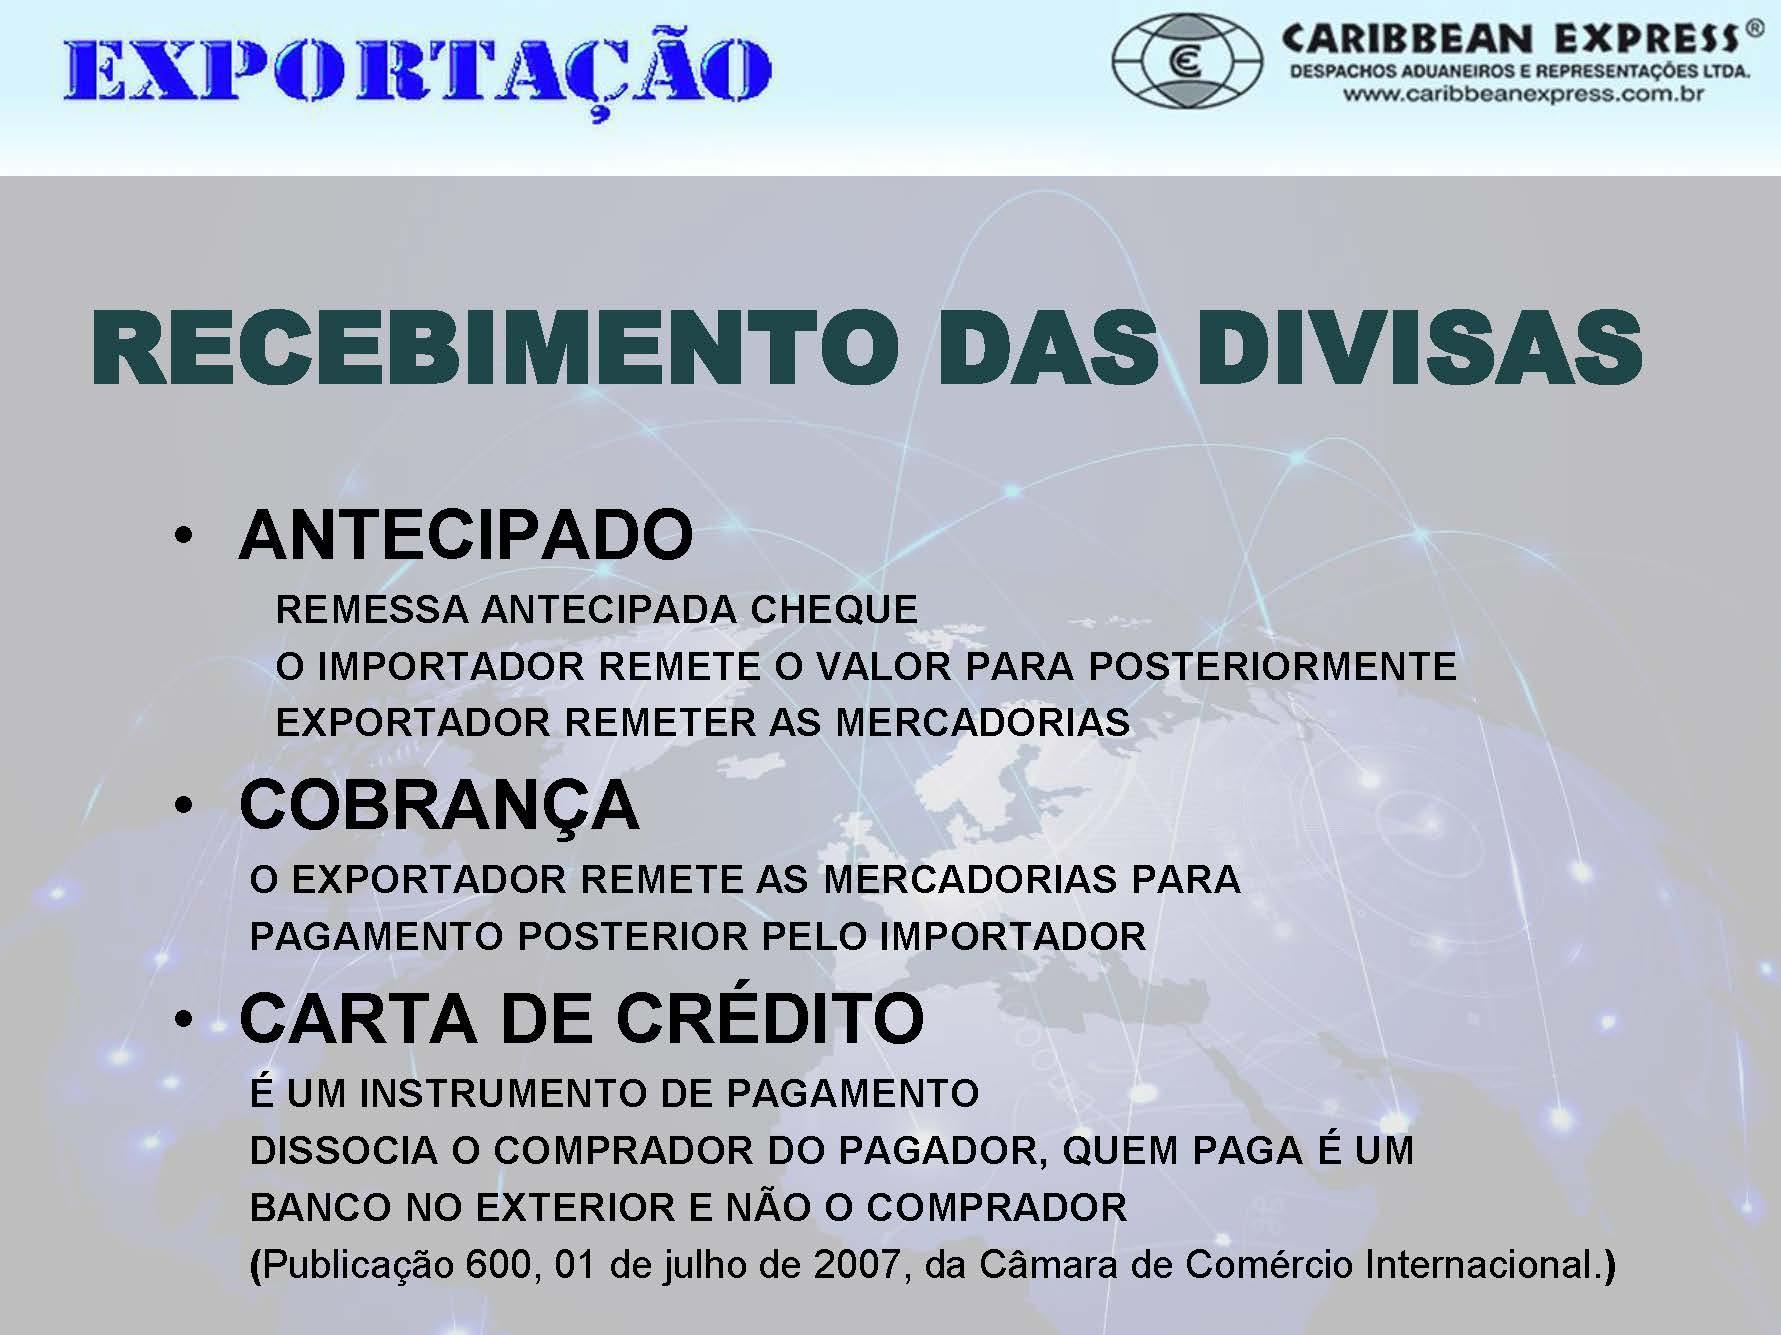 CIF = CUSTO DA MERCADORIA + FRETE + SEGURO